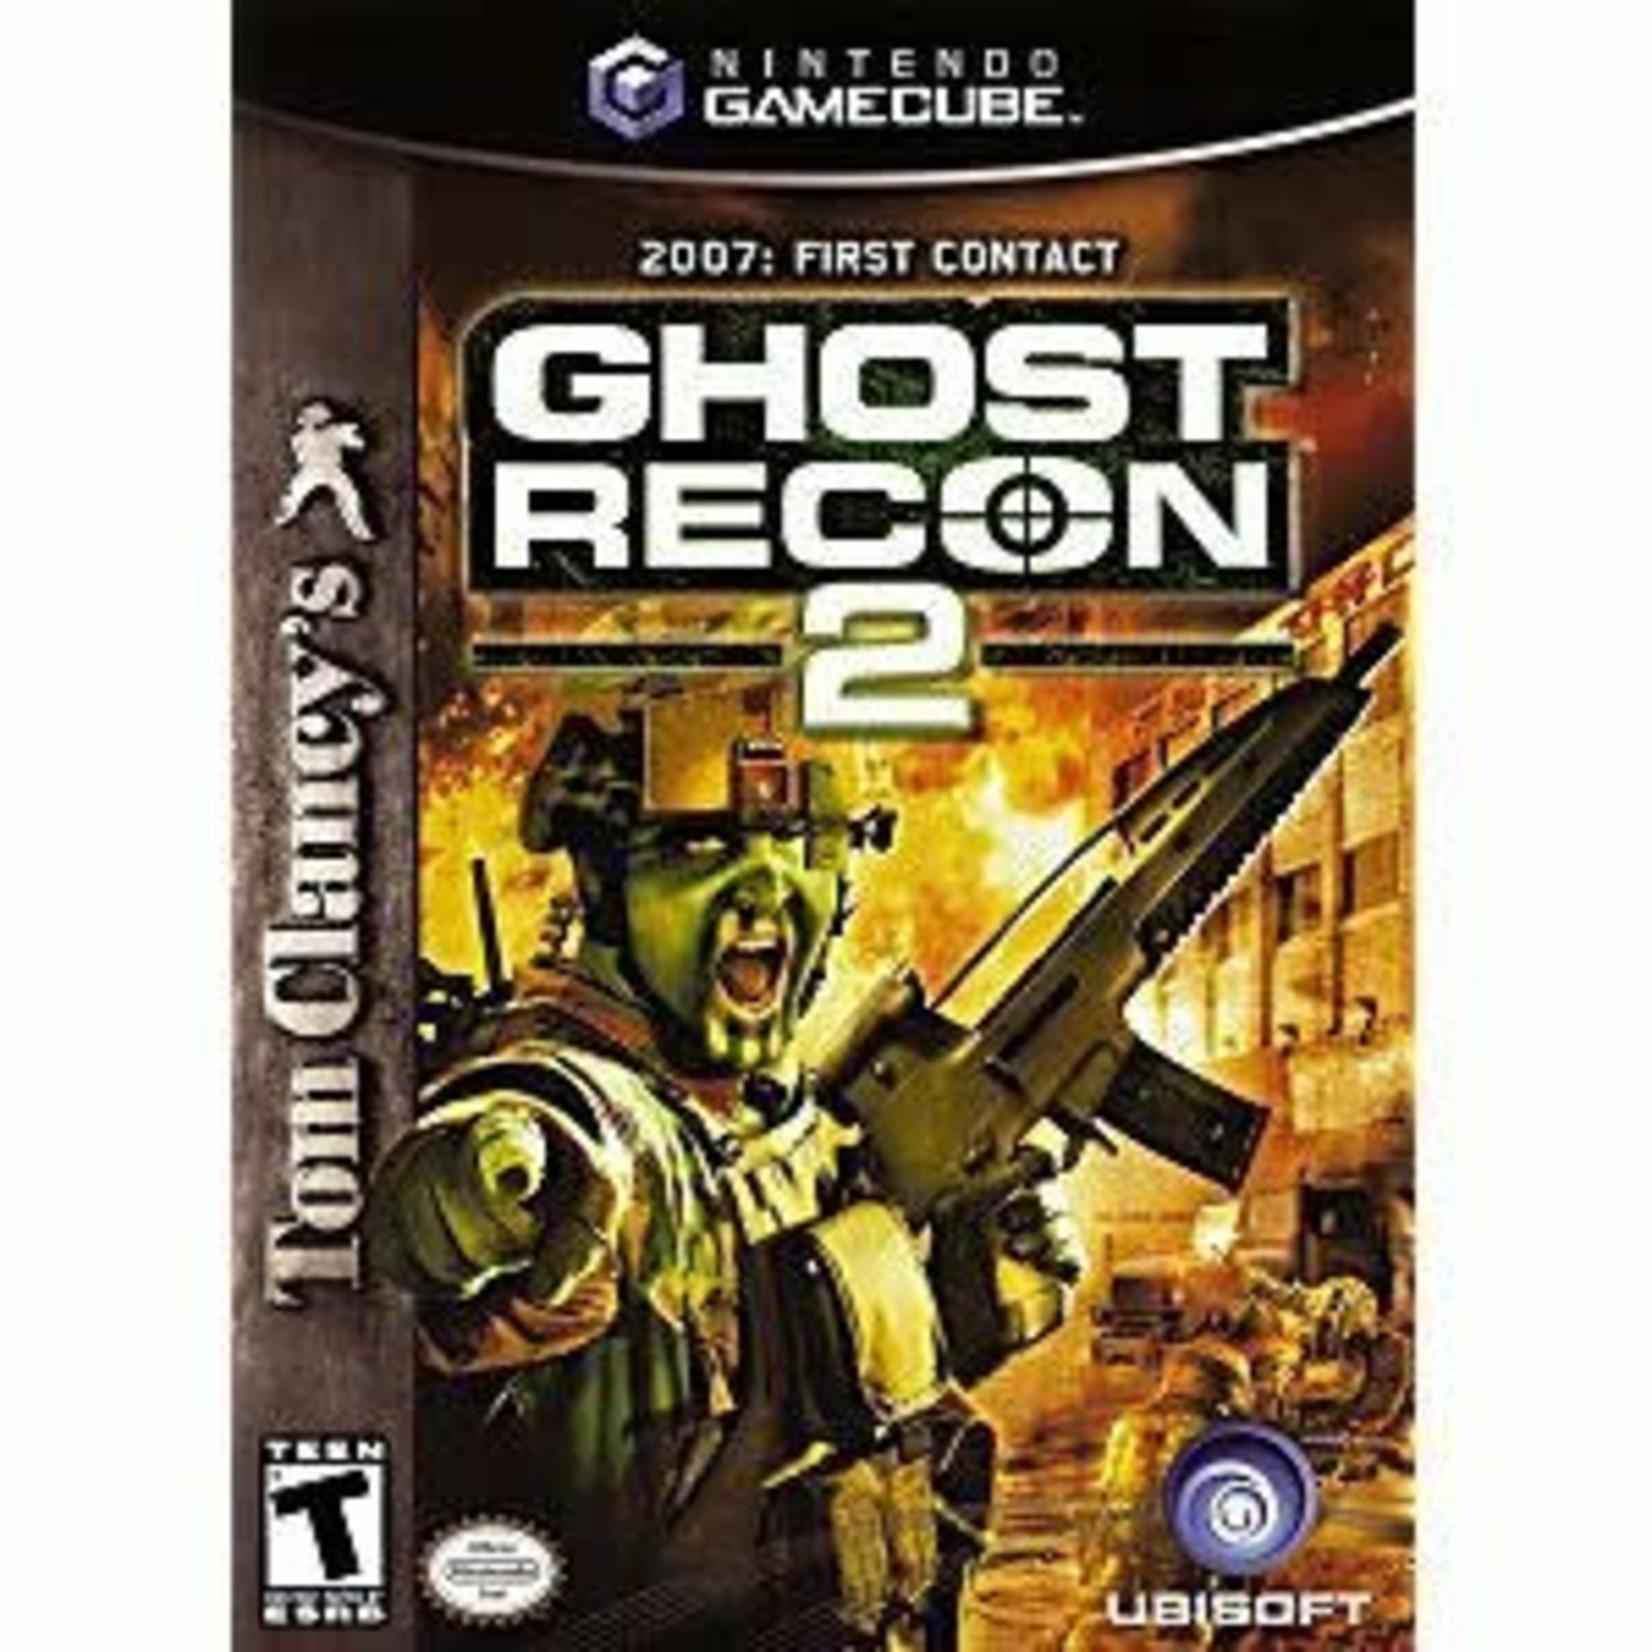 GCU-GHOST RECON 2